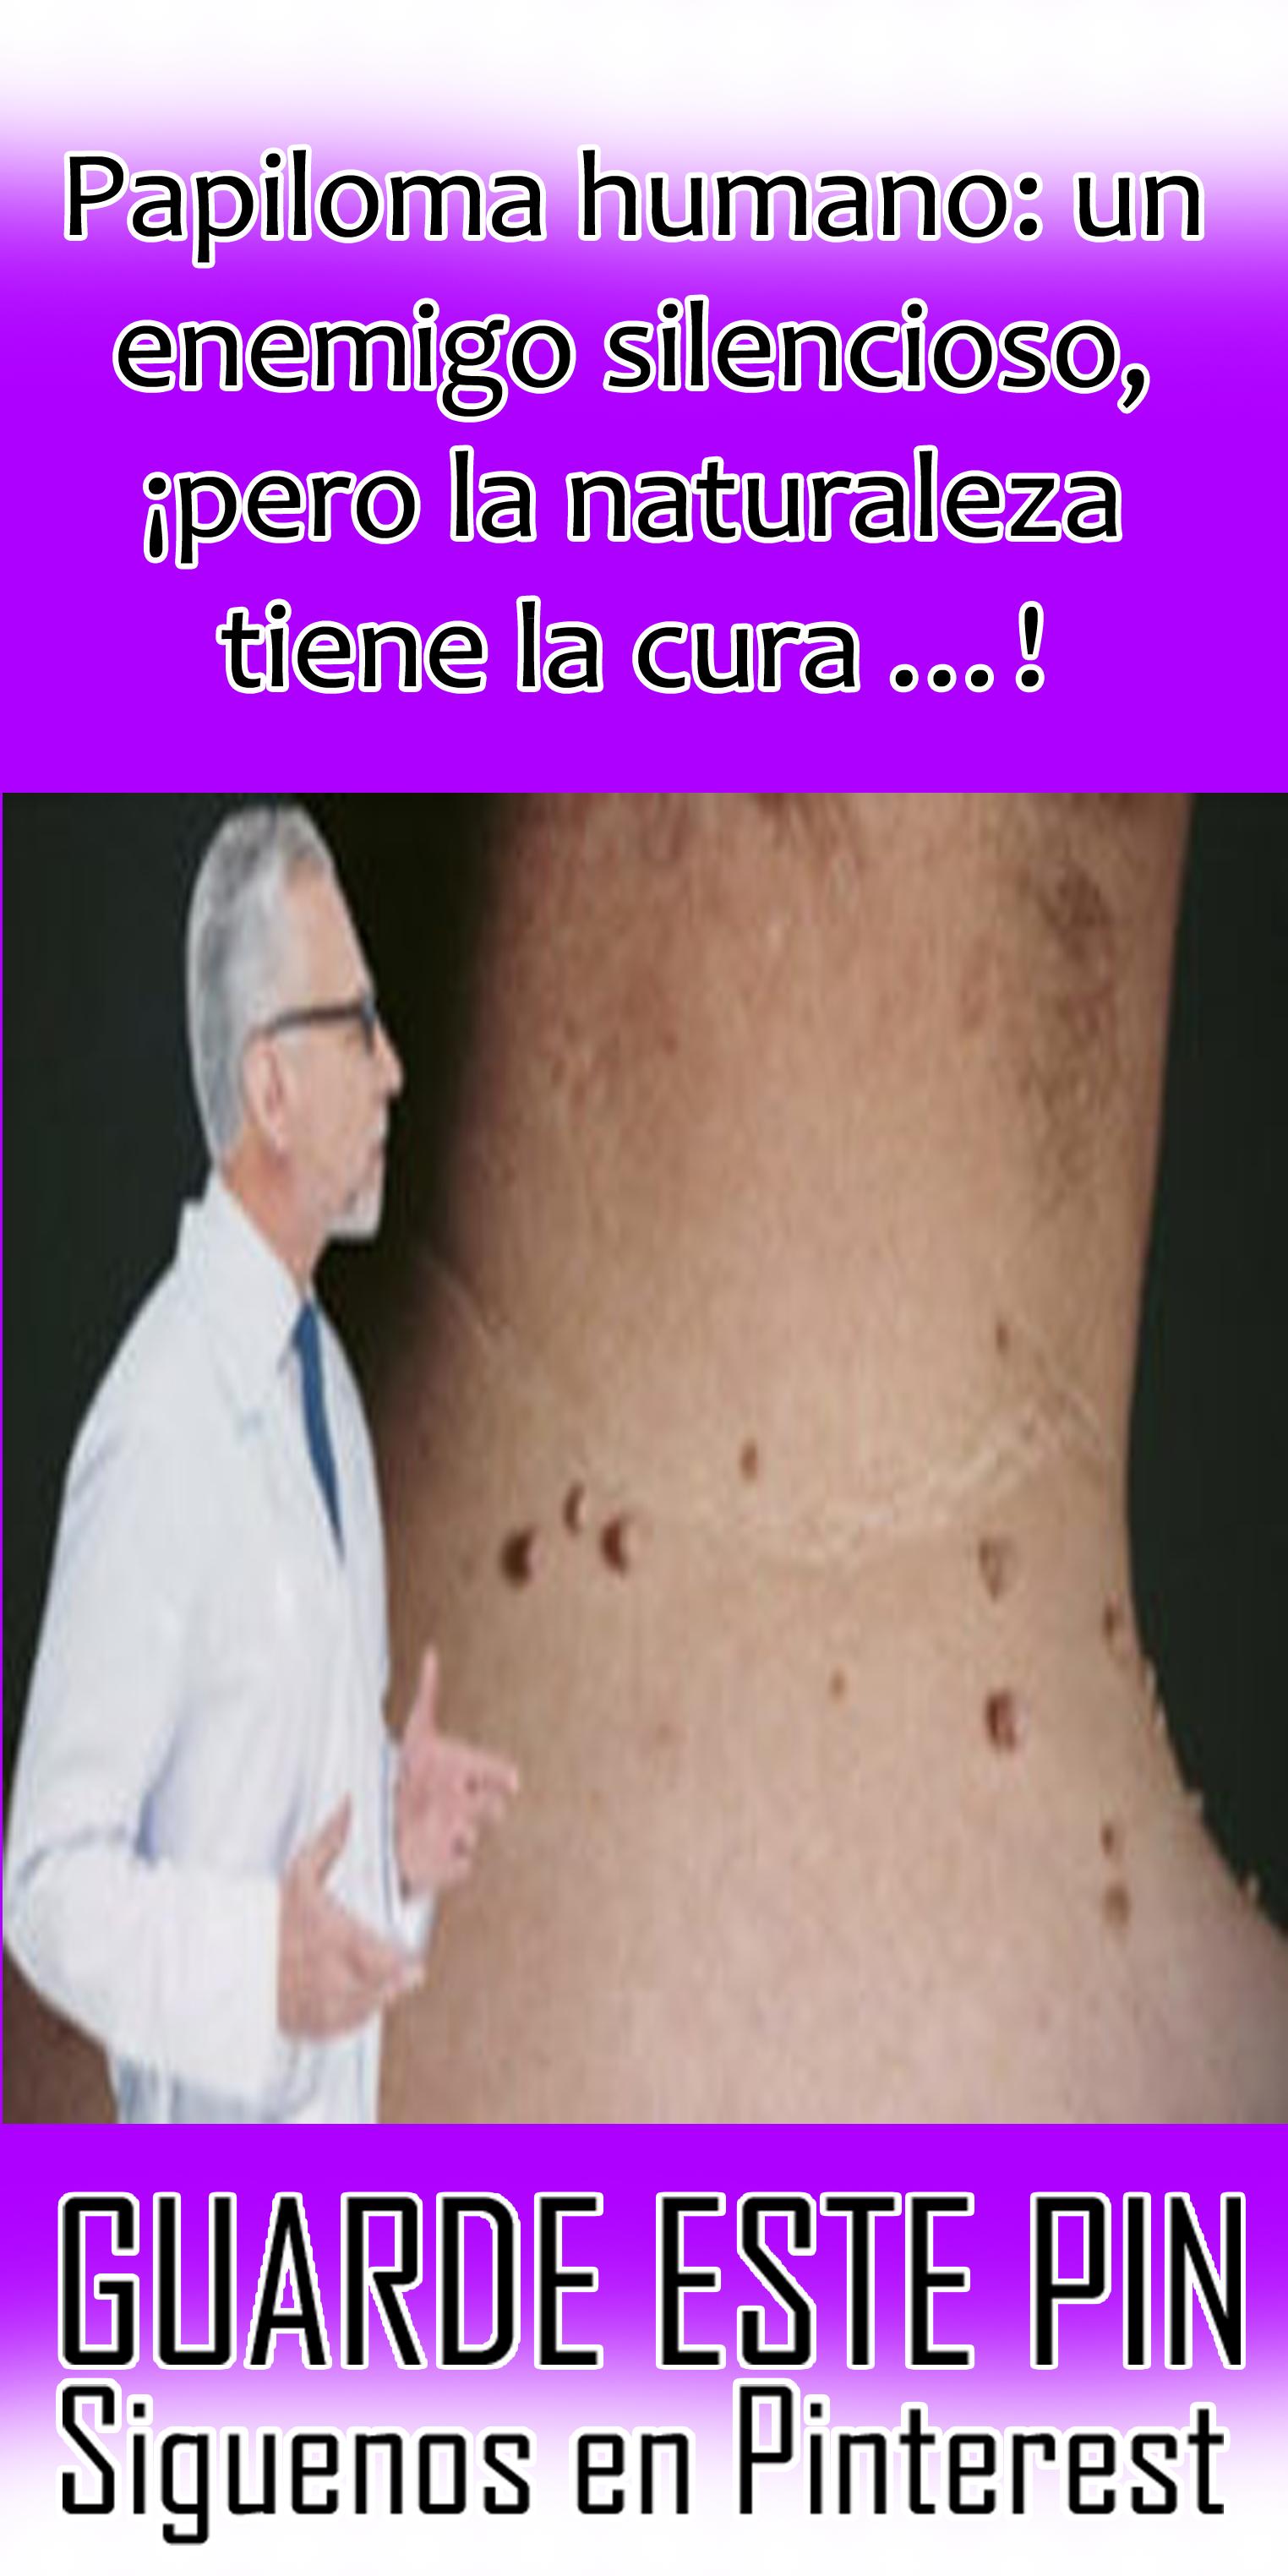 papiloma humano tiene curacion)